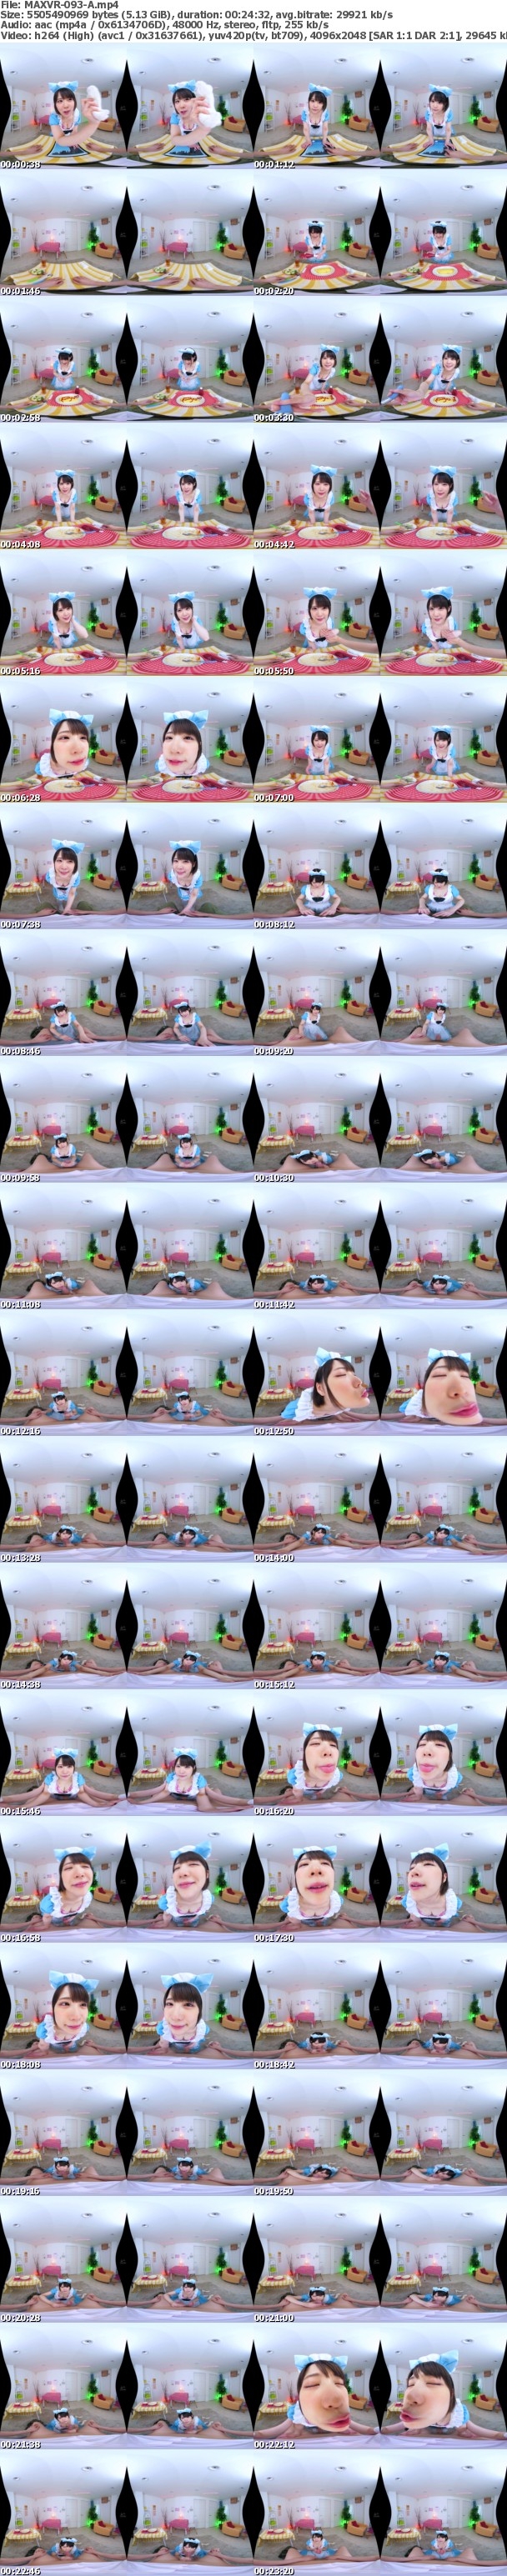 (VR) MAXVR-093 人気No.1メイドの(秘)従順ご奉仕(ハート) キュンキュンするメイドさんのご褒美が特別すぎたので愛情をたっぷり中に注入~ 横宮七海